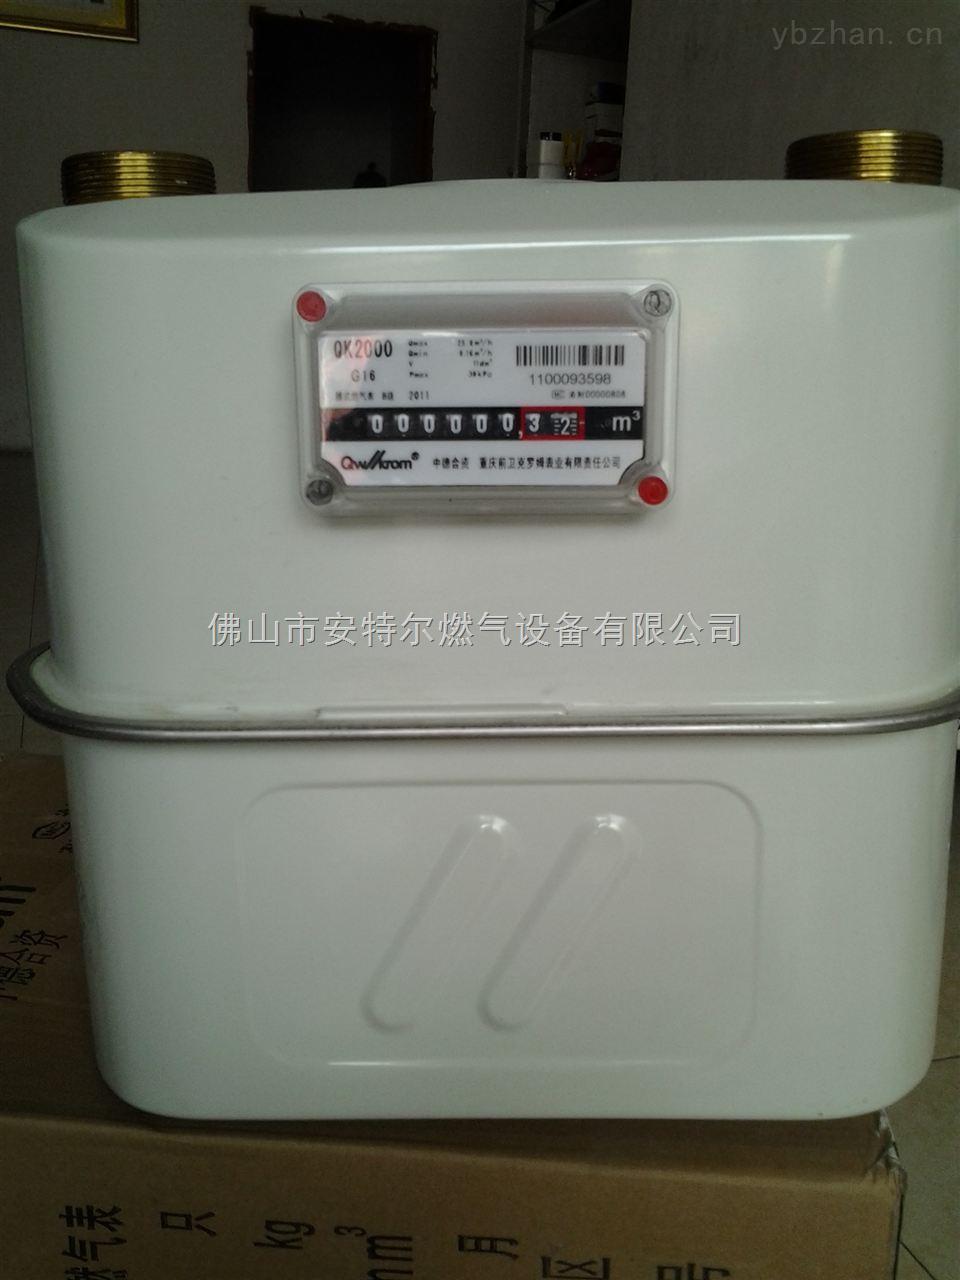 G16膜式燃氣表